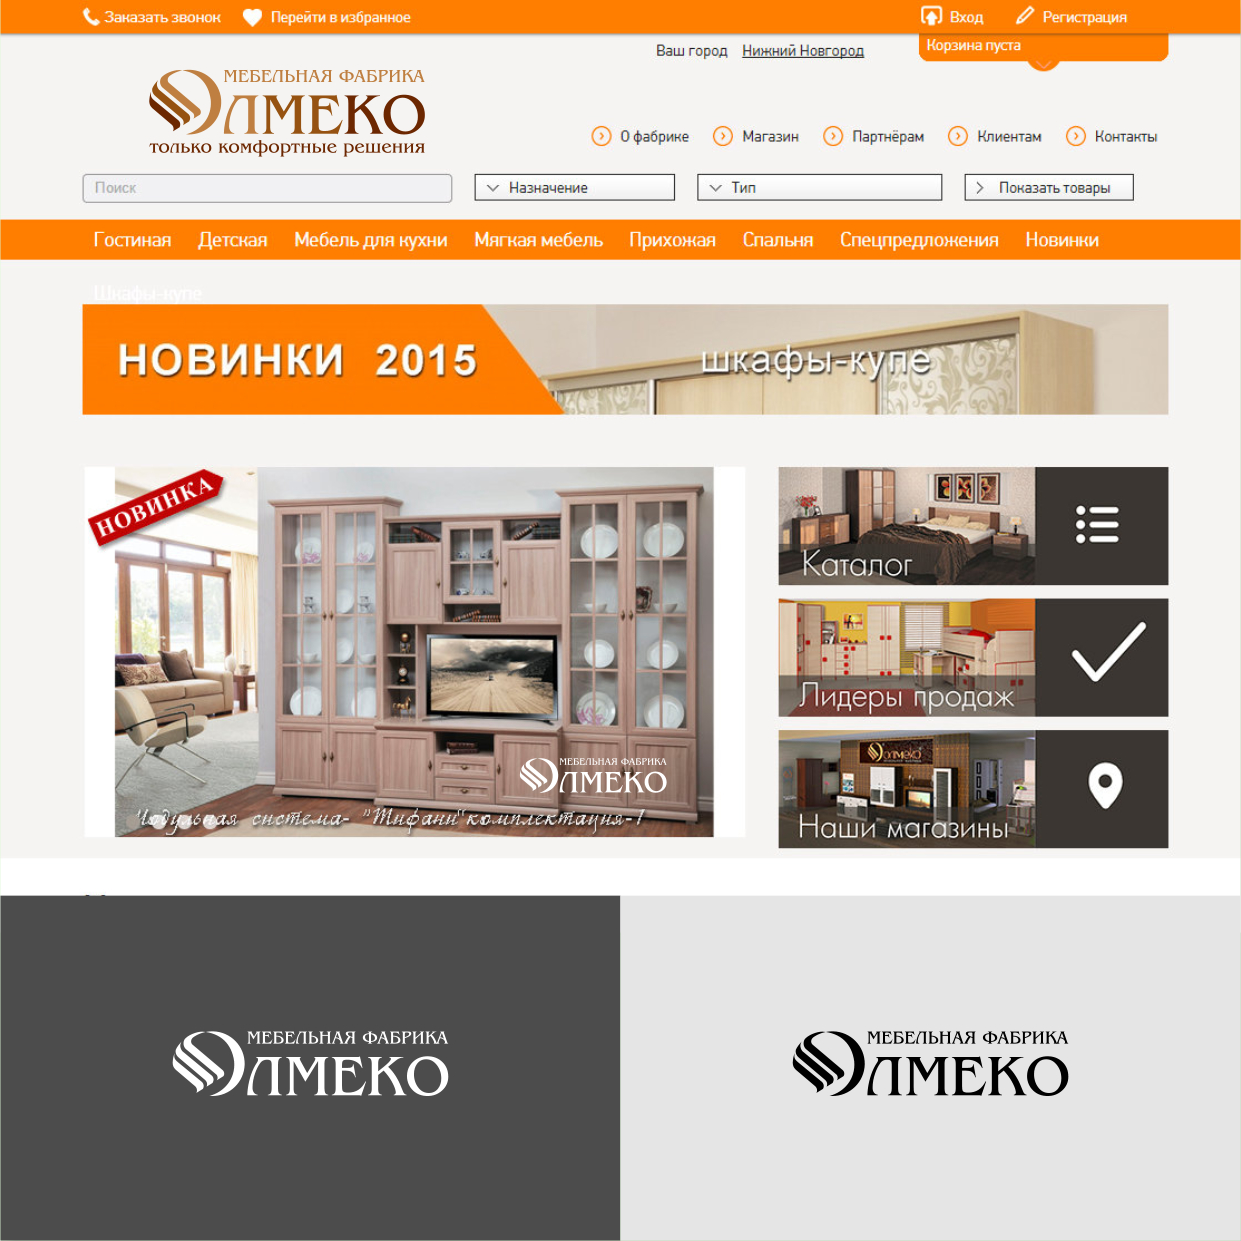 Ребрендинг/Редизайн логотипа Мебельной Фабрики фото f_8215492e9a5eb33f.jpg